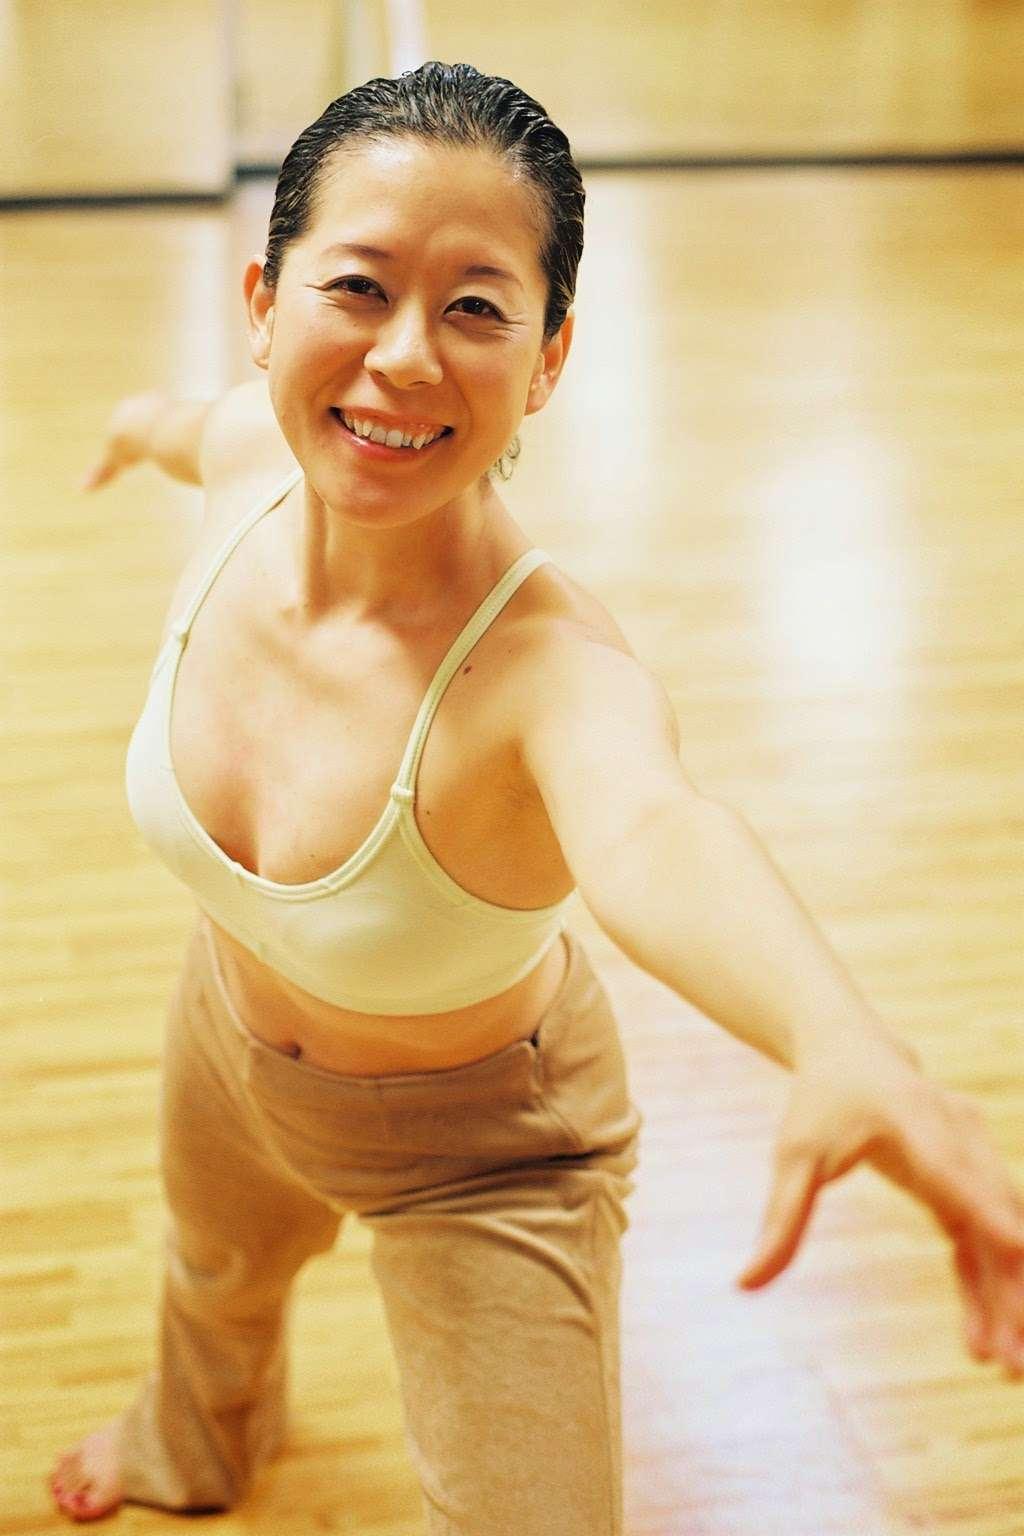 Planet Fitness White Plains Ny : planet, fitness, white, plains, Stanton's, Health, Fitness,, Hillside, White, Plains,, 10603,